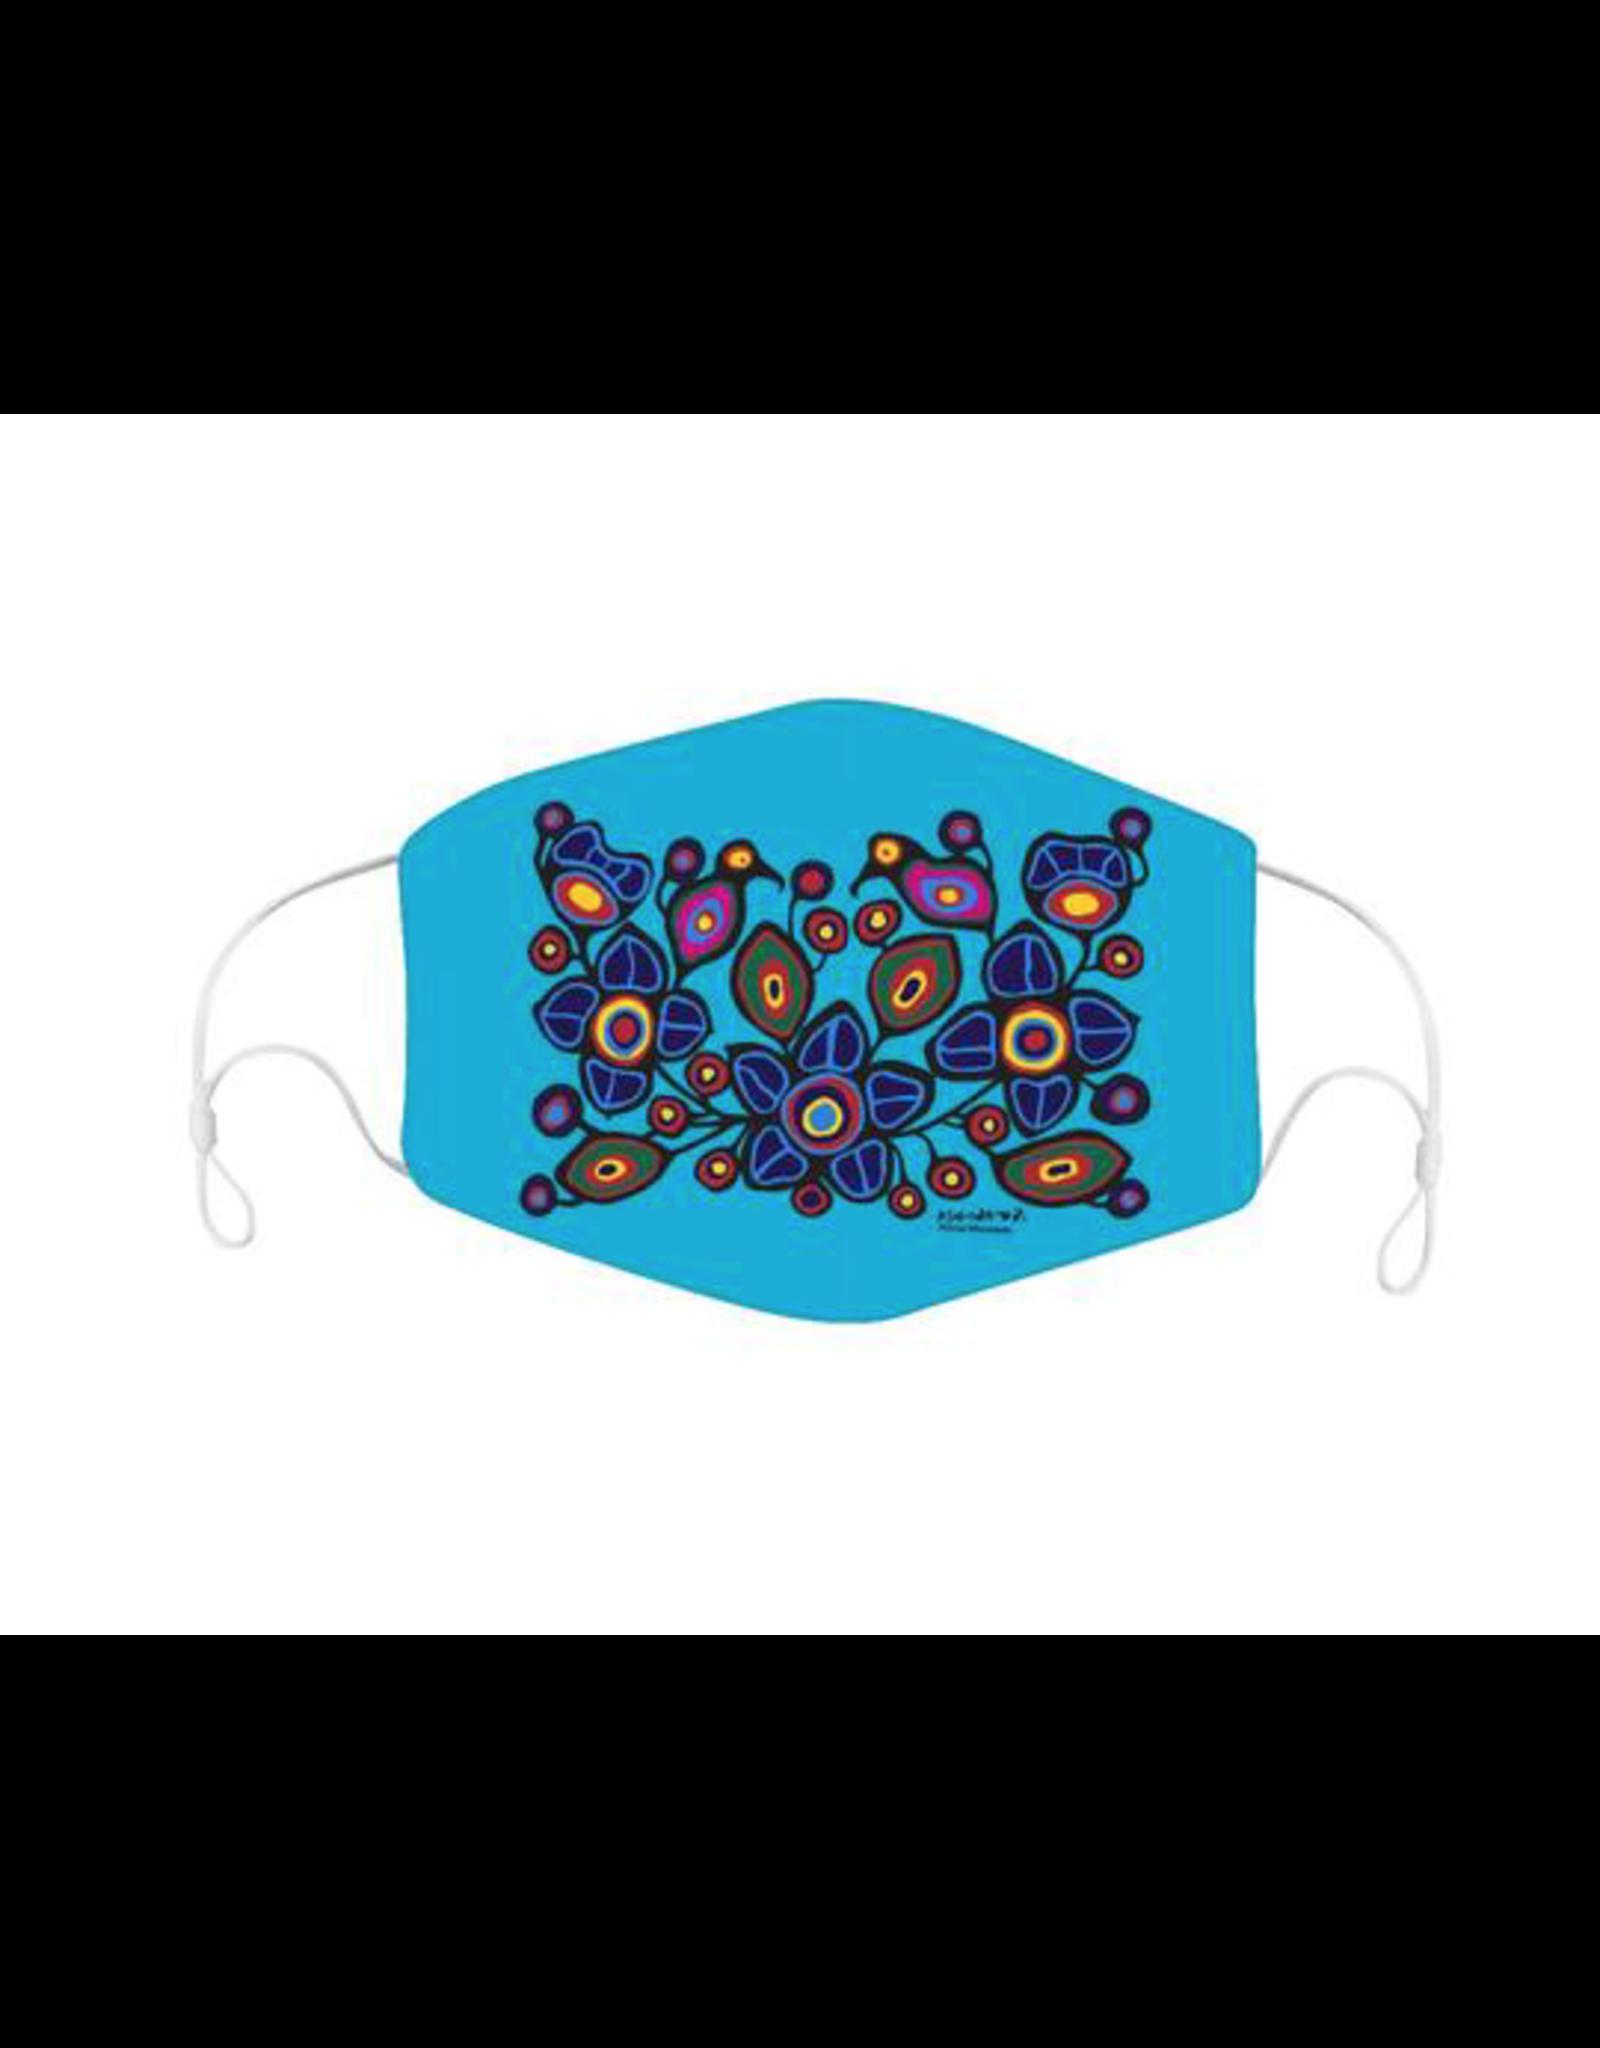 Reusable Face Mask Flowers & Birds by Norval Morrisseau